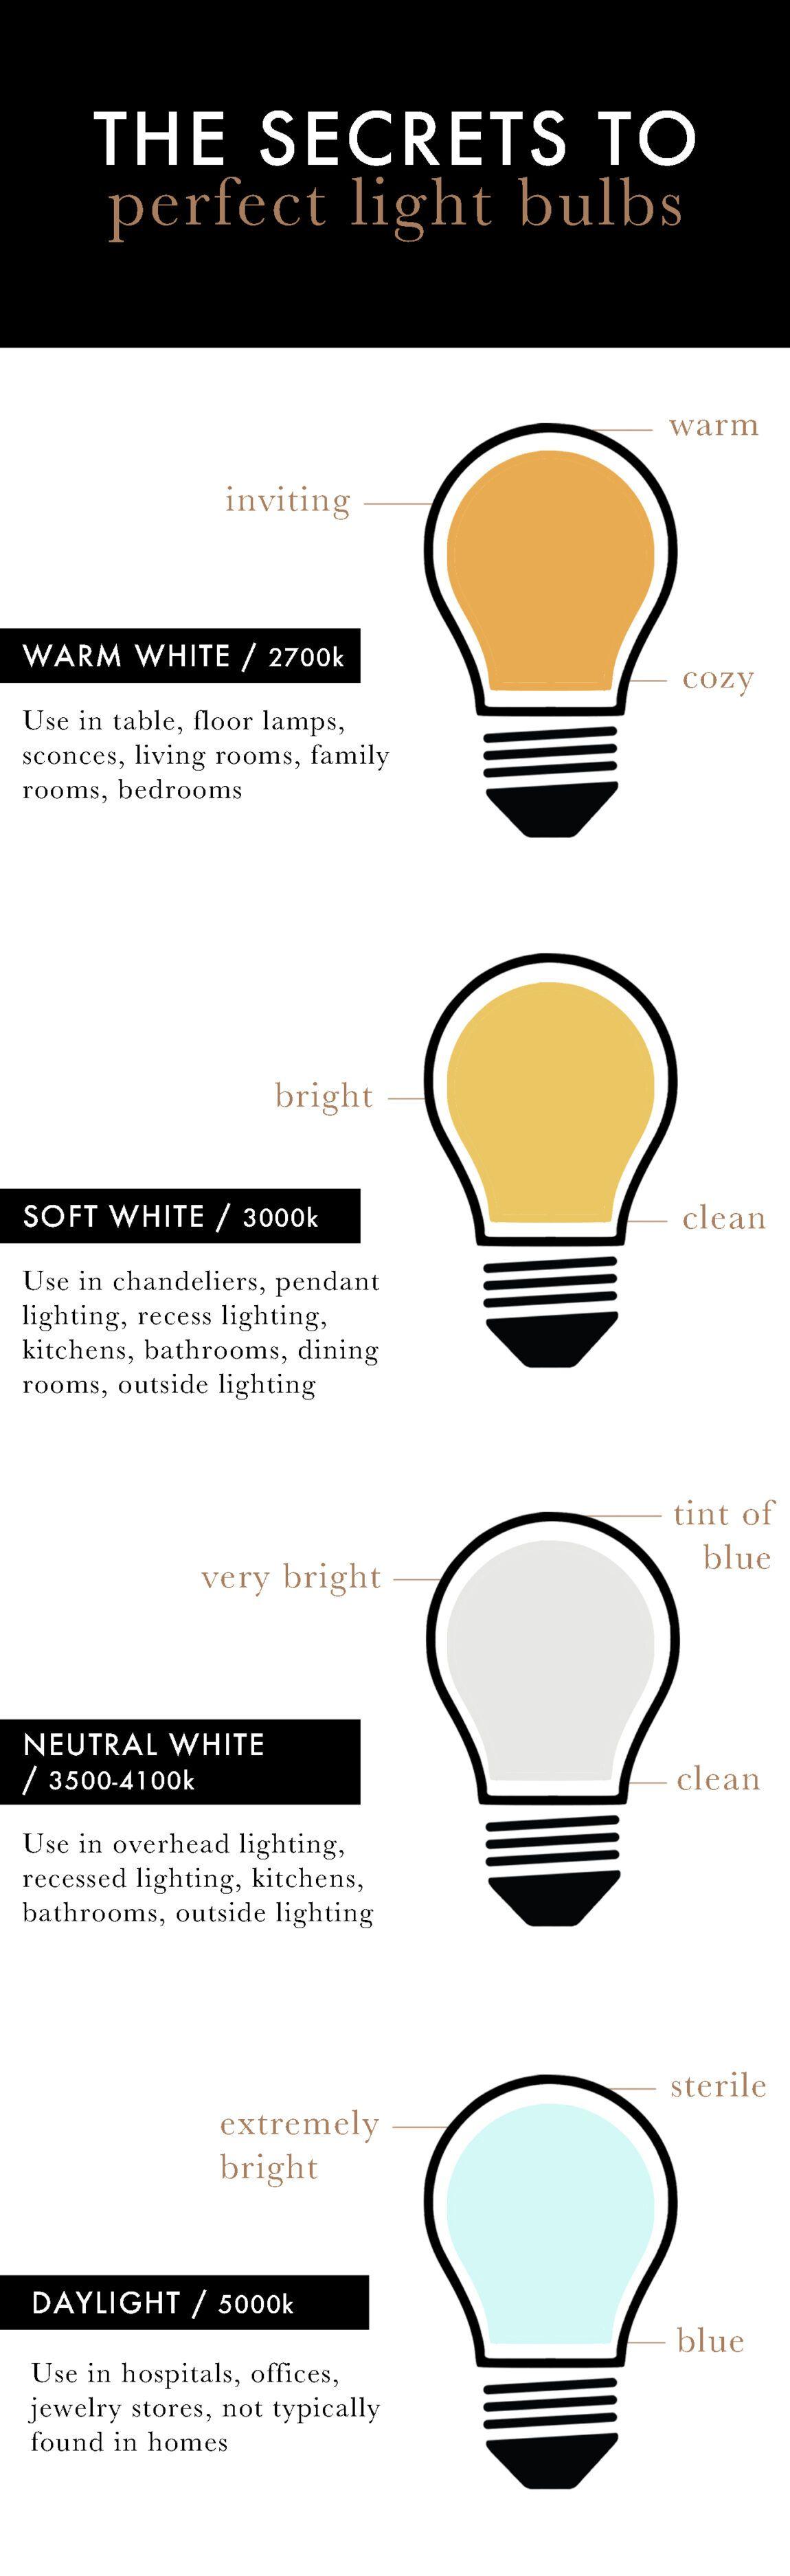 Warm Light Vs Daylight : light, daylight, SECRETS, PERFECT, LIGHT, BULBS, CLARK, ALDINE, Light, Bulb,, Chandelier,, Bulbs